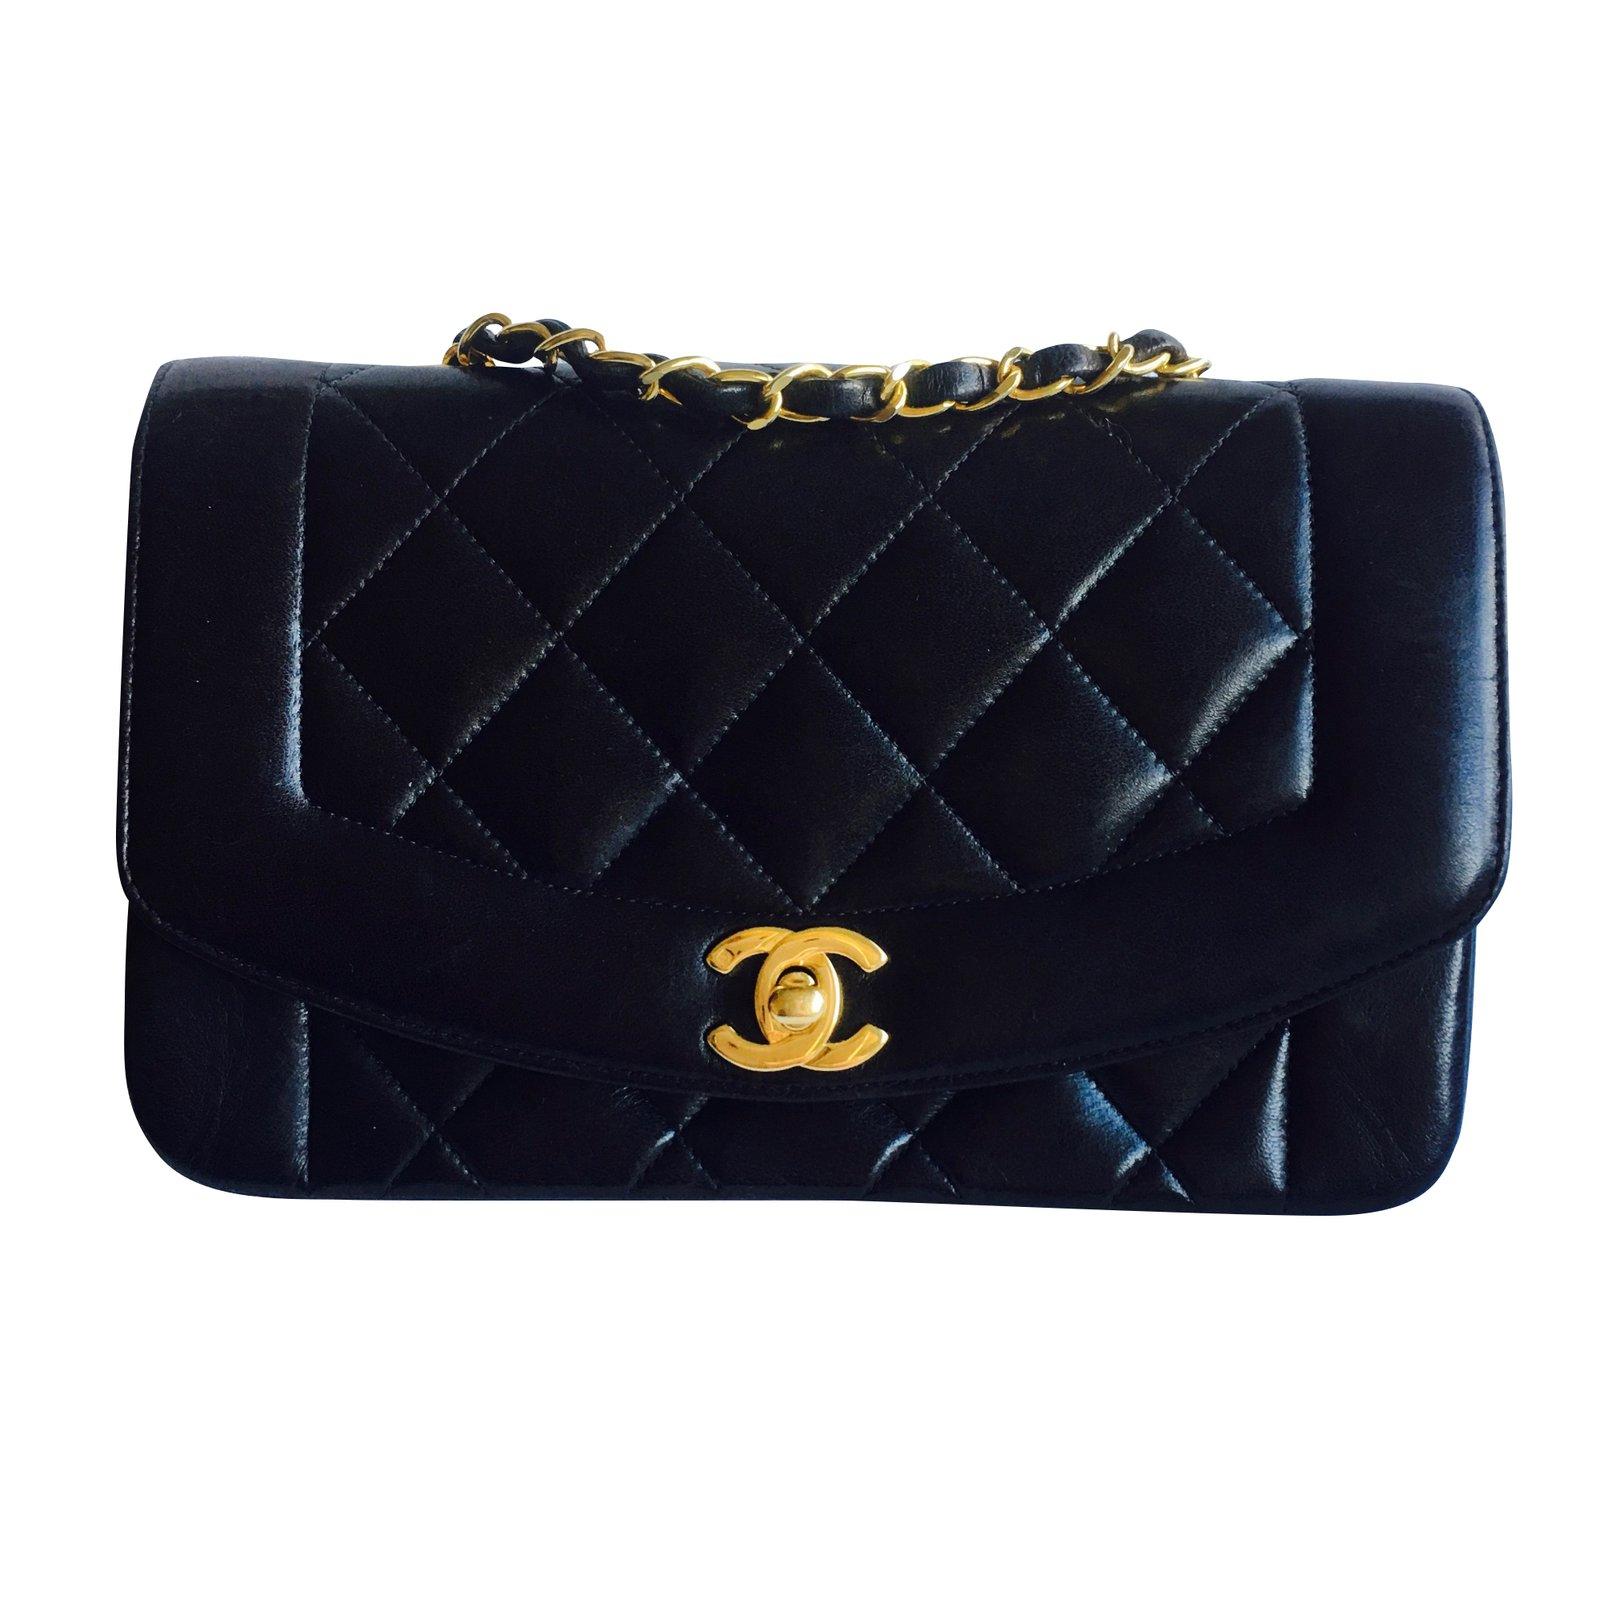 Chanel timeless vintage diana handbags leather black ref - Vintage chanel ...